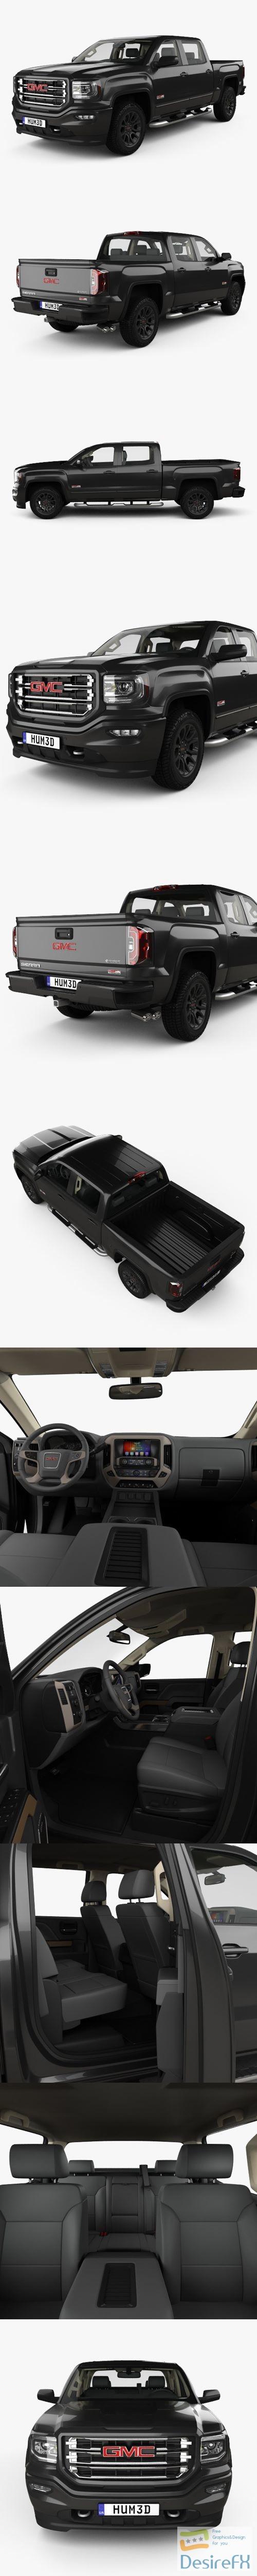 3d-models - GMC Sierra 1500 Crew Cab Short Box AllTerrain with HQ interior 2017 3D Model